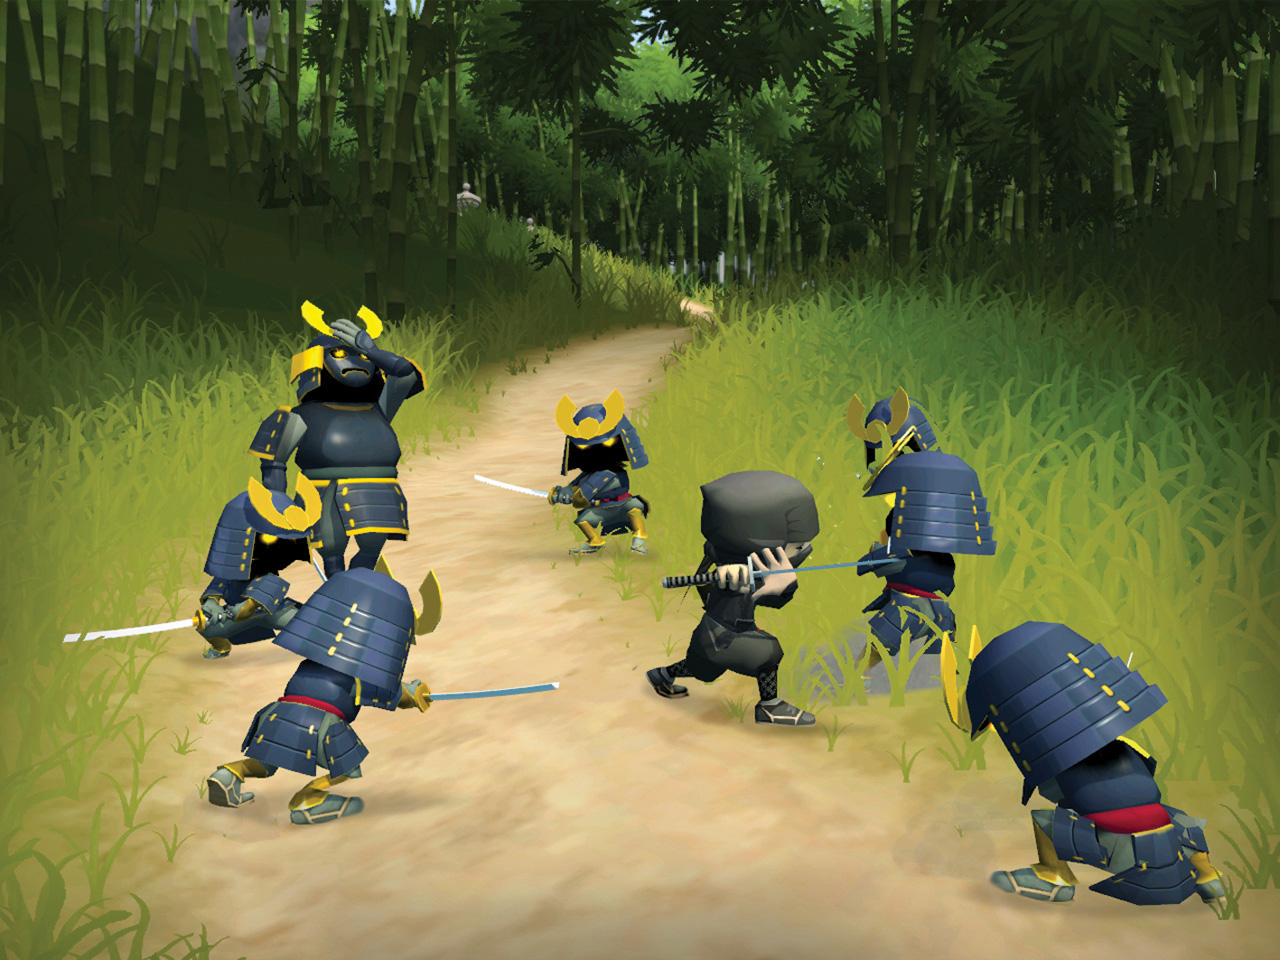 [TEST] Mini Ninjas – la version pour Mac